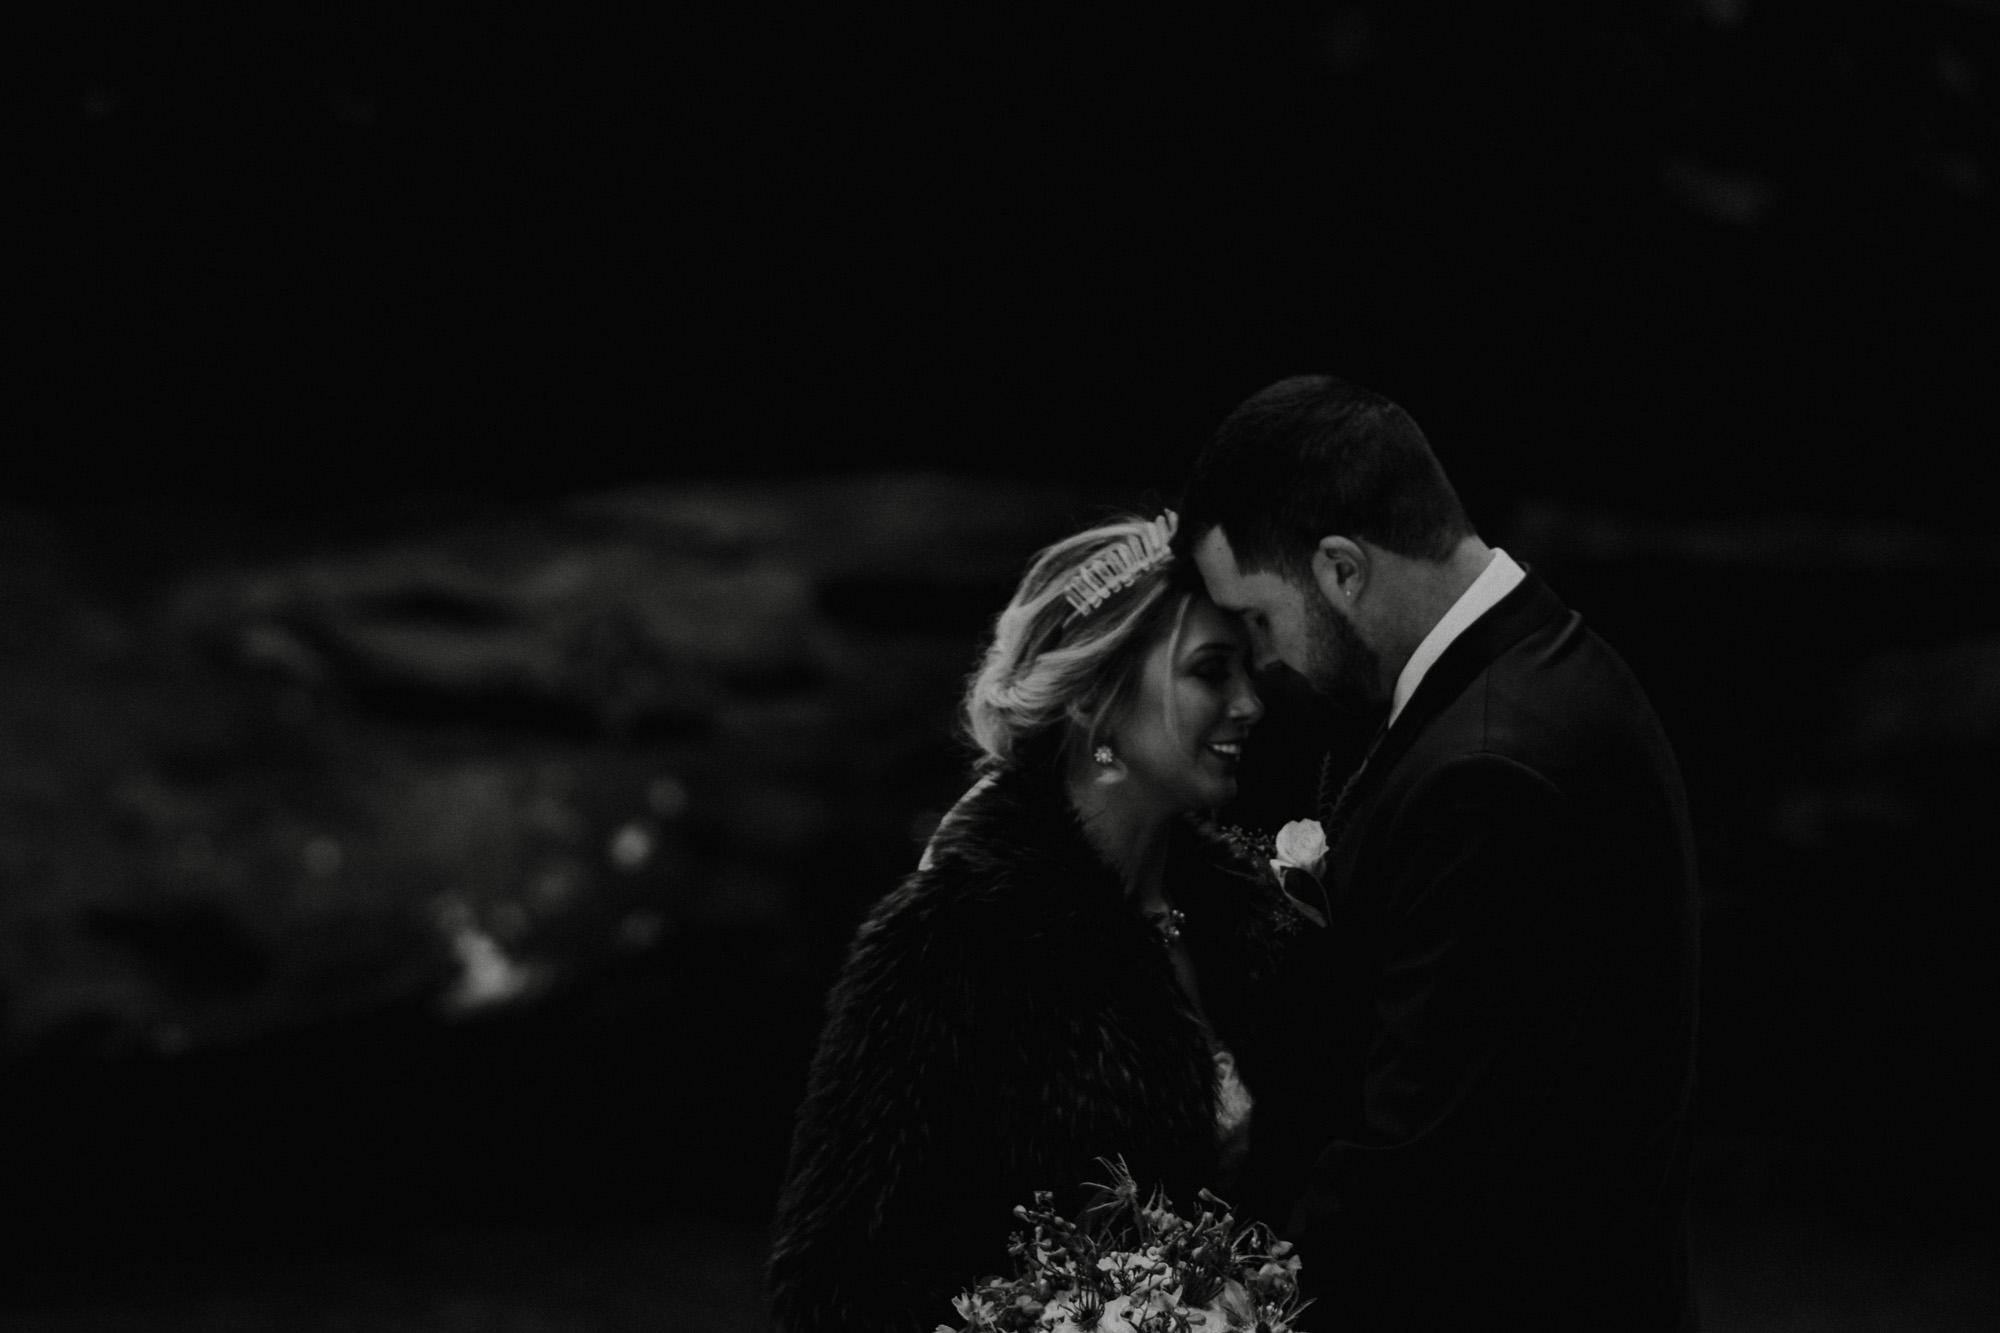 Cate_Ann_Photography_Dayton_Ohio_Wedding_Elopement_And_Engagement_PhotographerDSC_6113.jpg